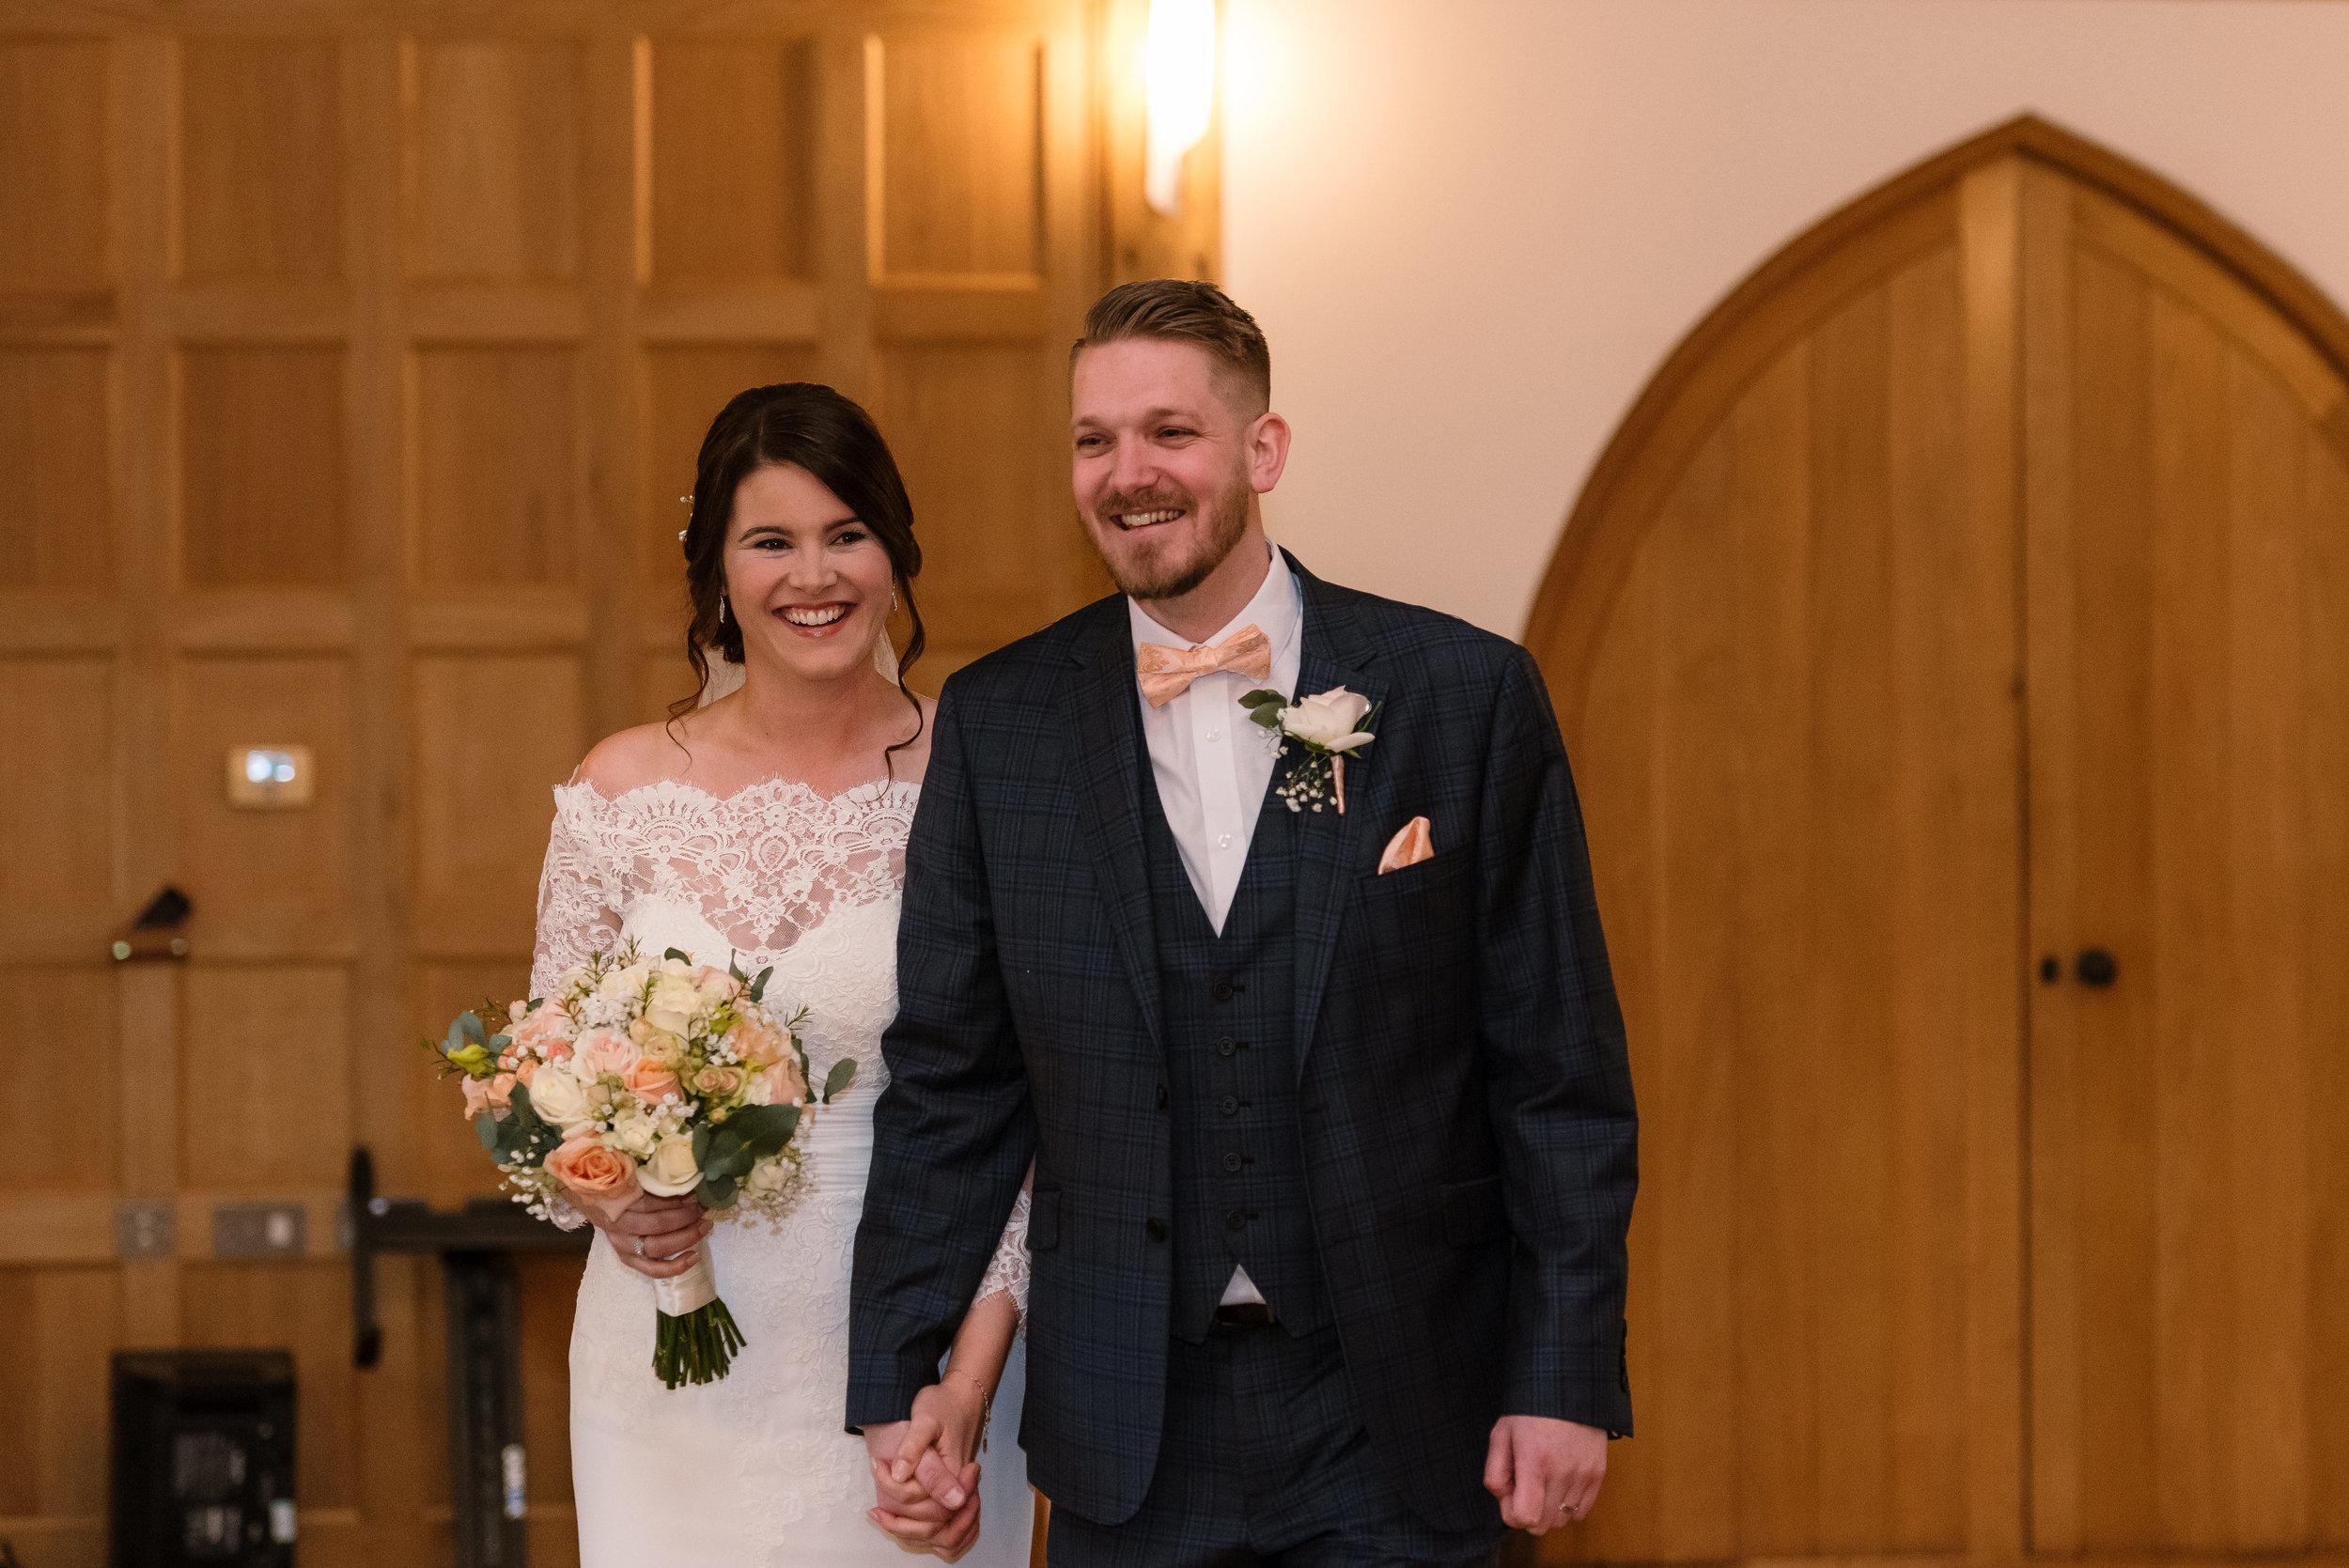 Sarah-Fishlock-Photography-Hampshire-wedding-photographer-hampshire / fleet-wedding-photographer-fleet / hampshire-wedding-venue / barn-wedding-hampshire / rivervale-barn / wedding-in-snow